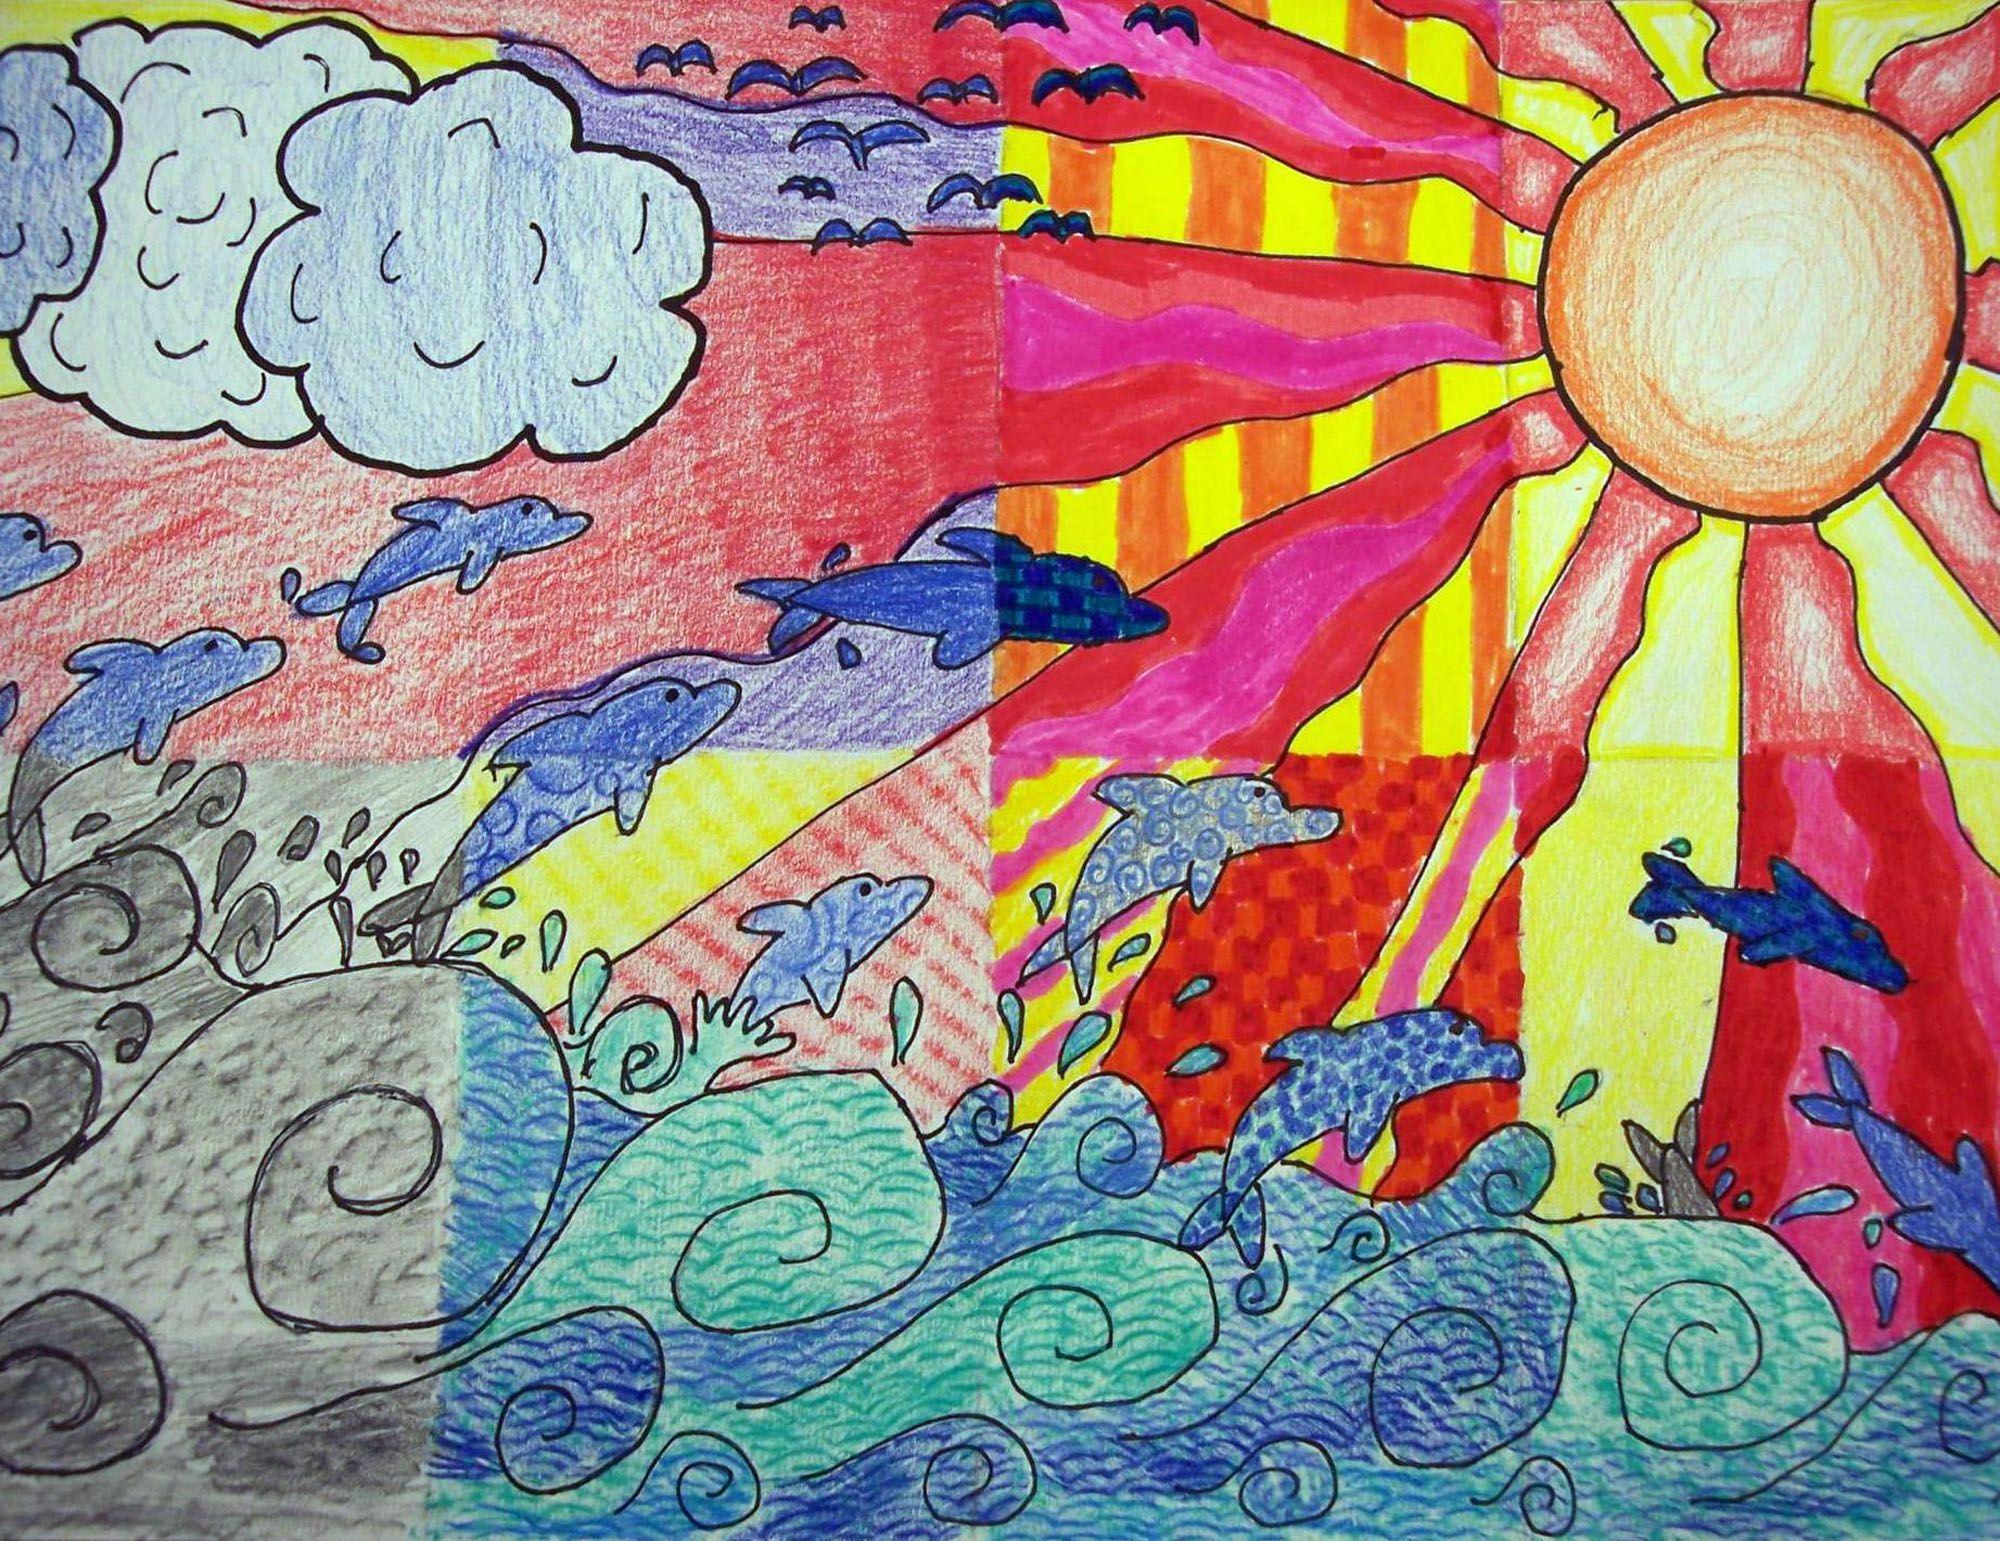 Elements Of Art Project 8th Grade